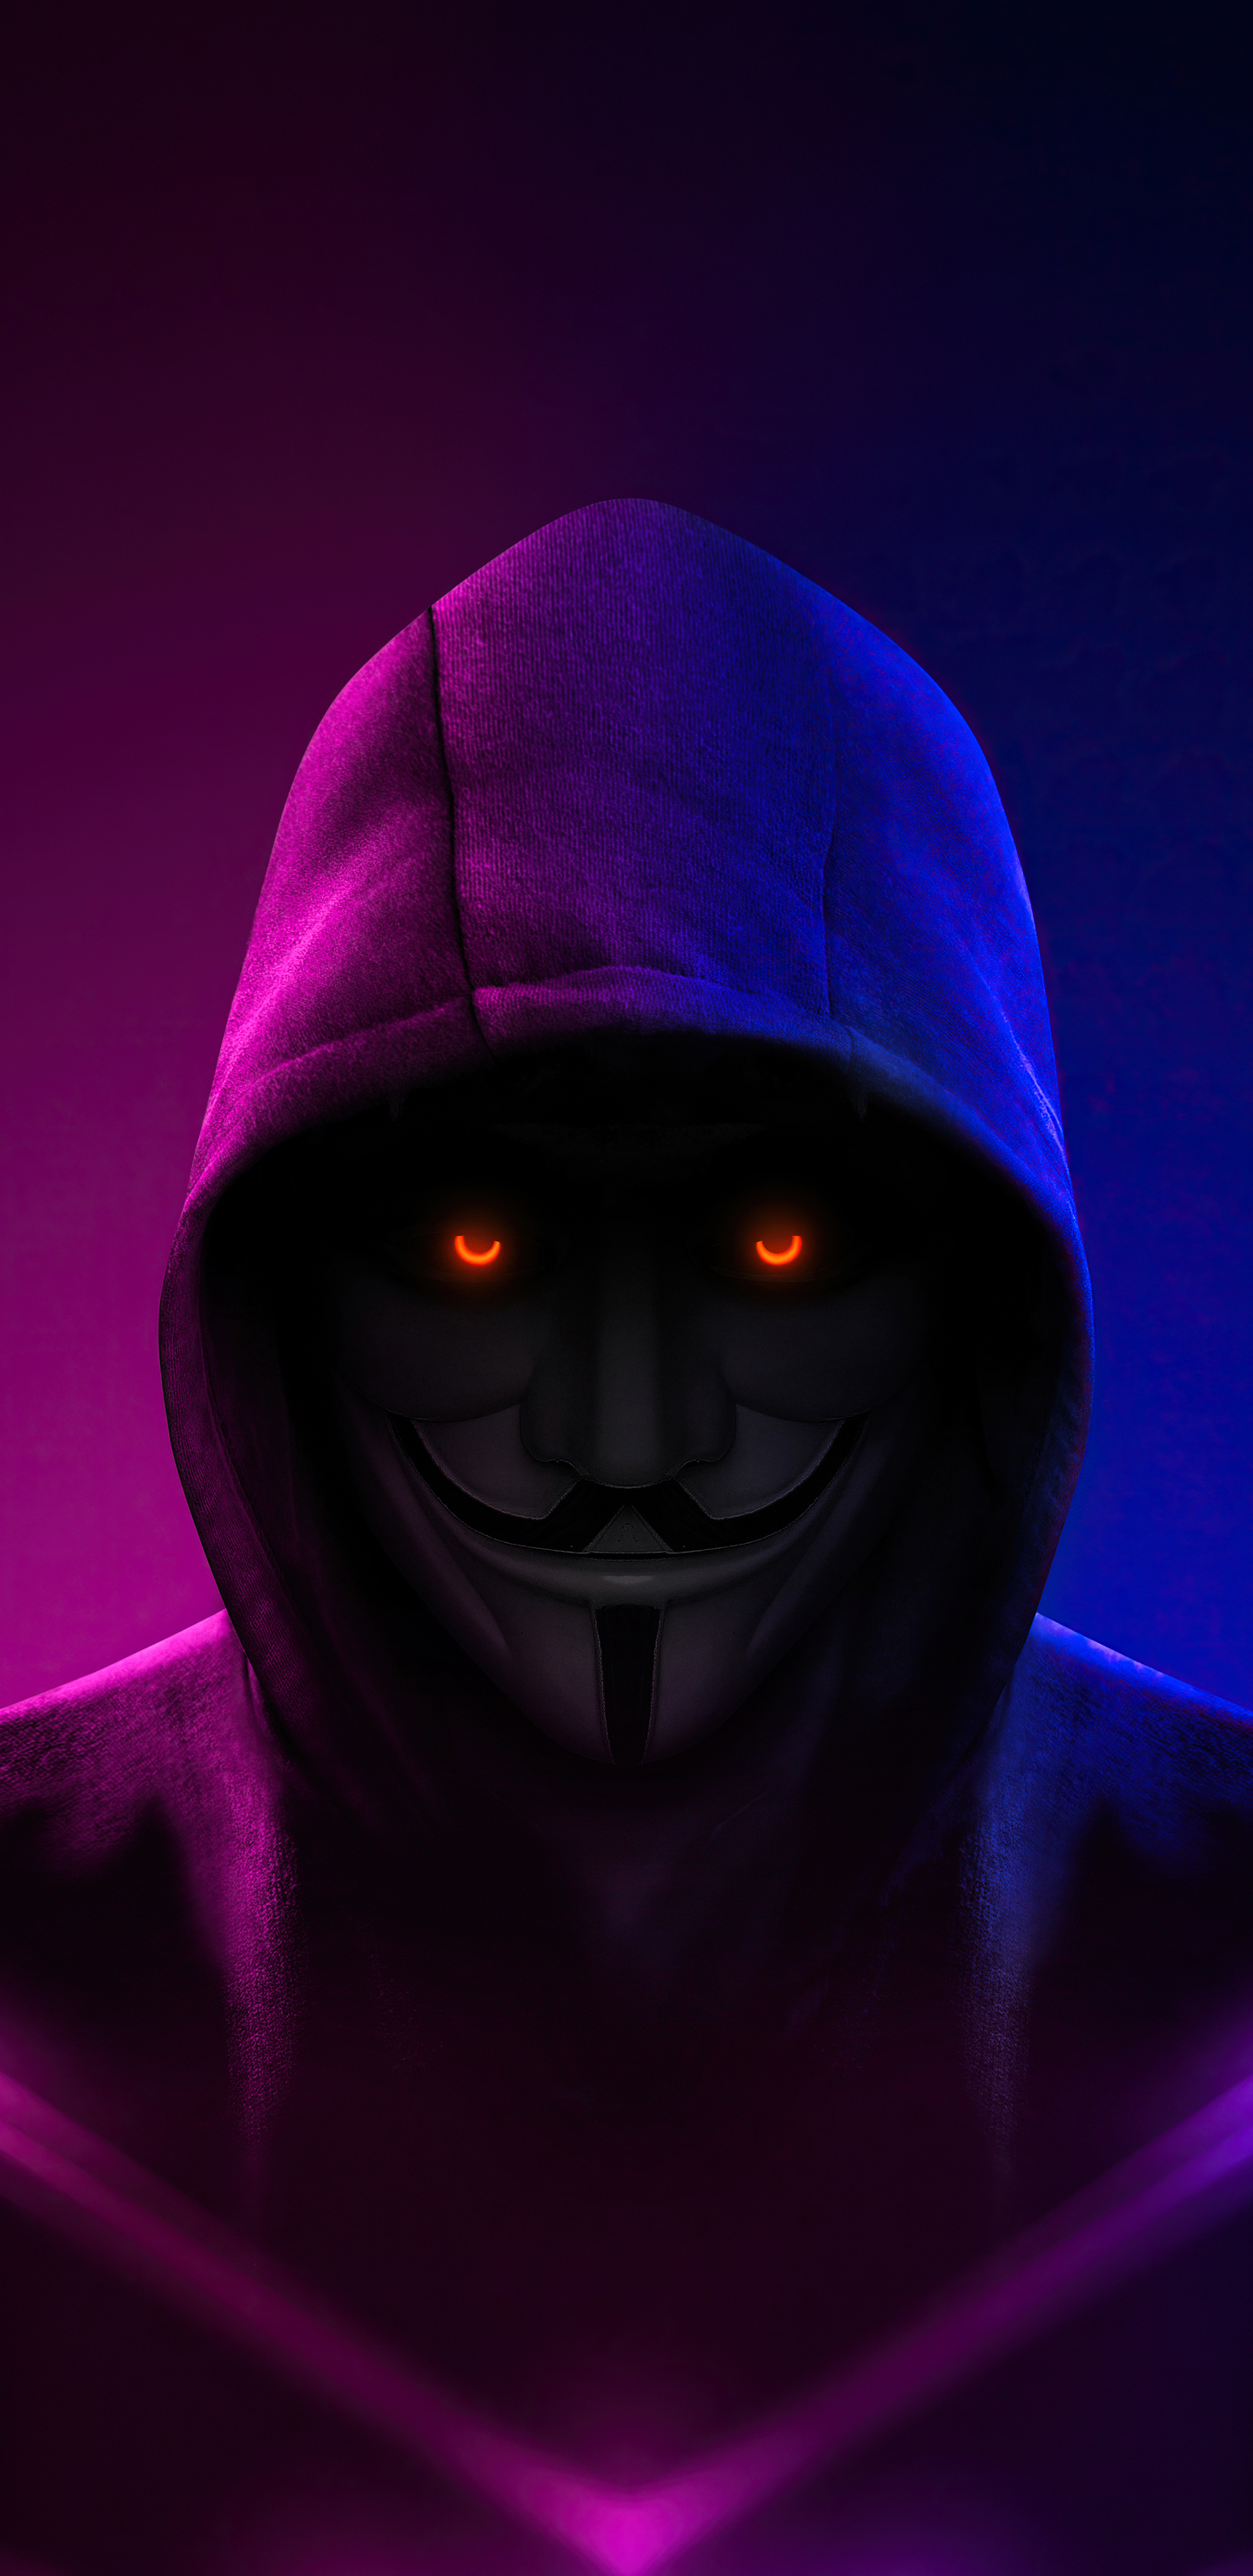 anonymus-hoodie-closeup-4k-ky.jpg